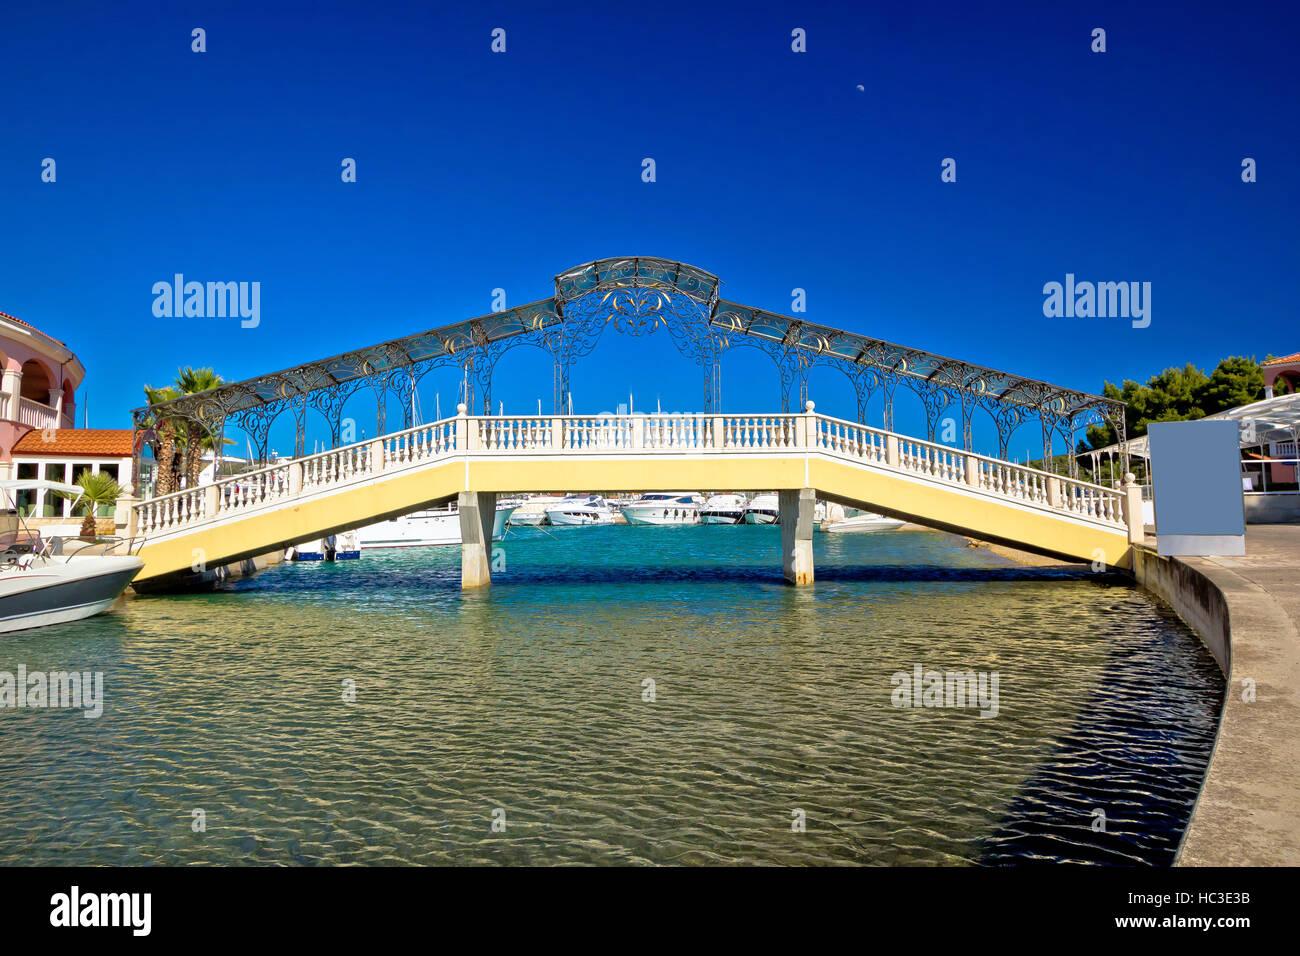 Adriatic town of Rogoznica iron bridge, Dalmatia, Croatia - Stock Image